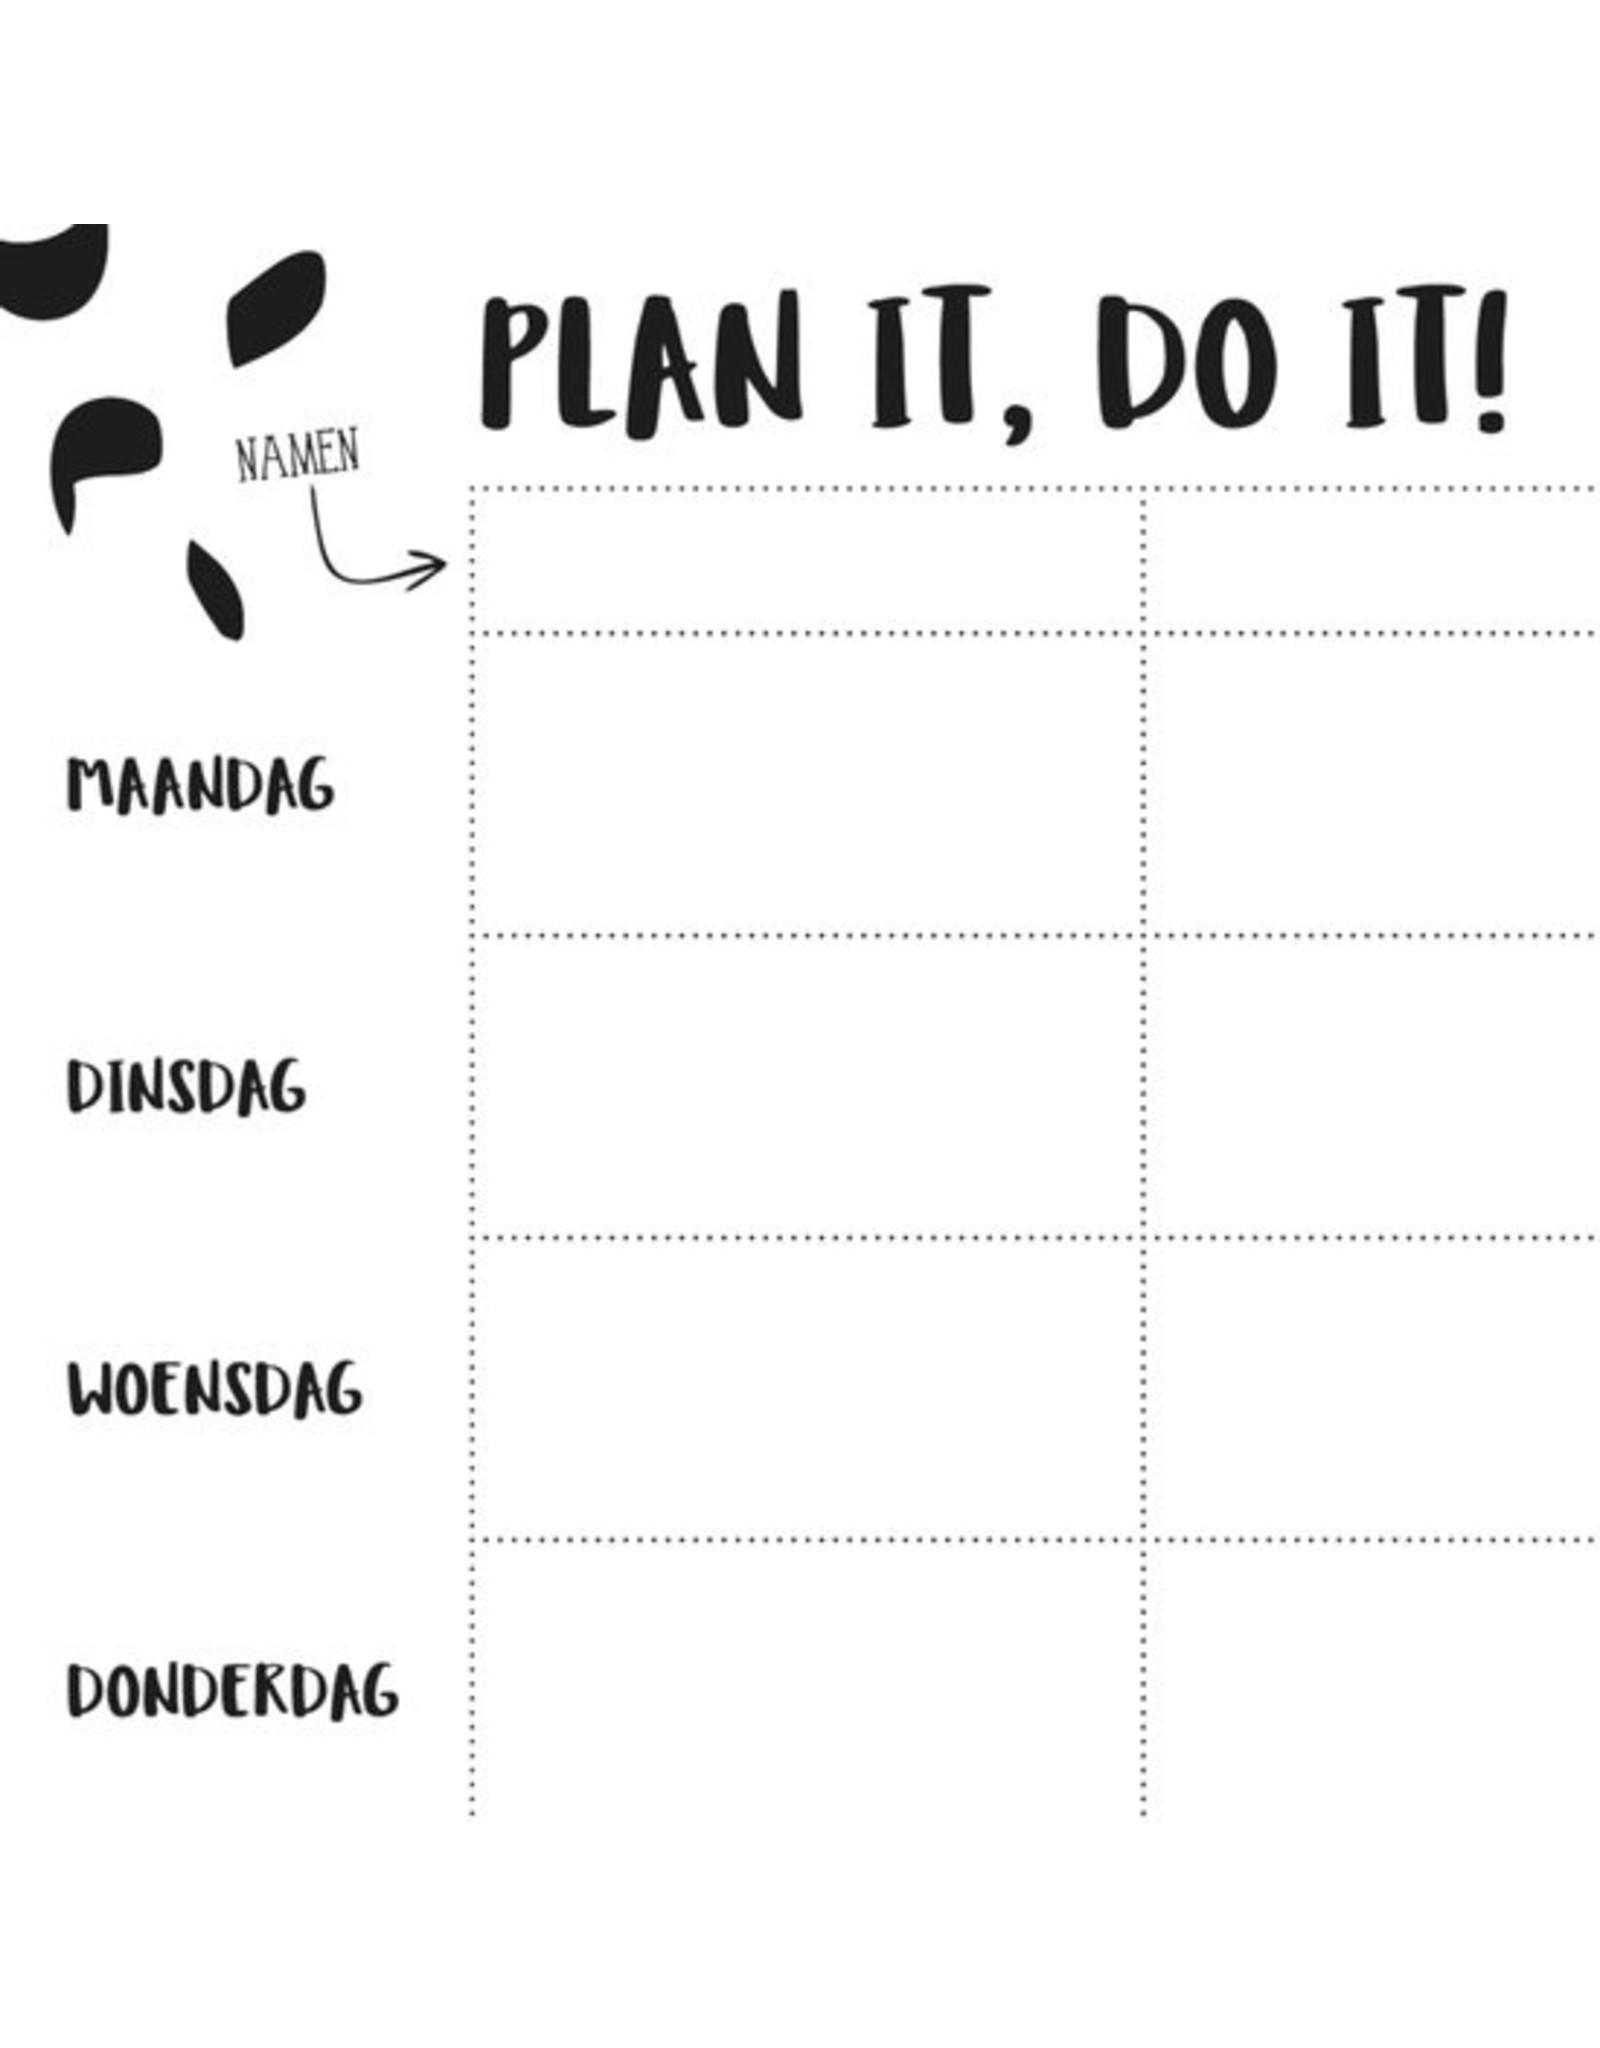 Oh My Goody Planner A4 - plan it. do it (weekplanner)